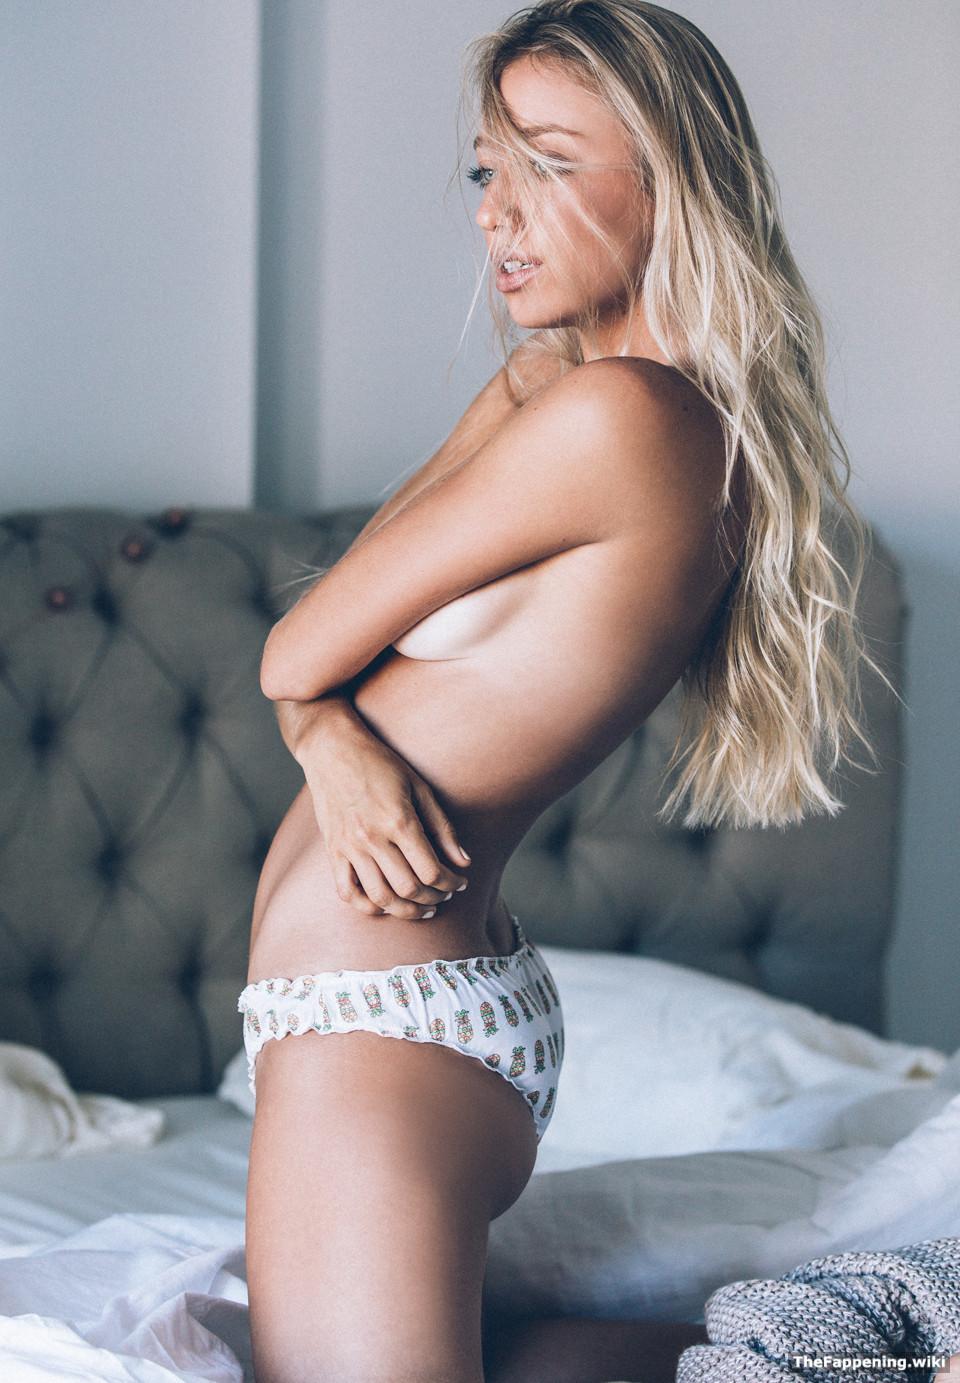 Nude Macy Mariano nude photos 2019